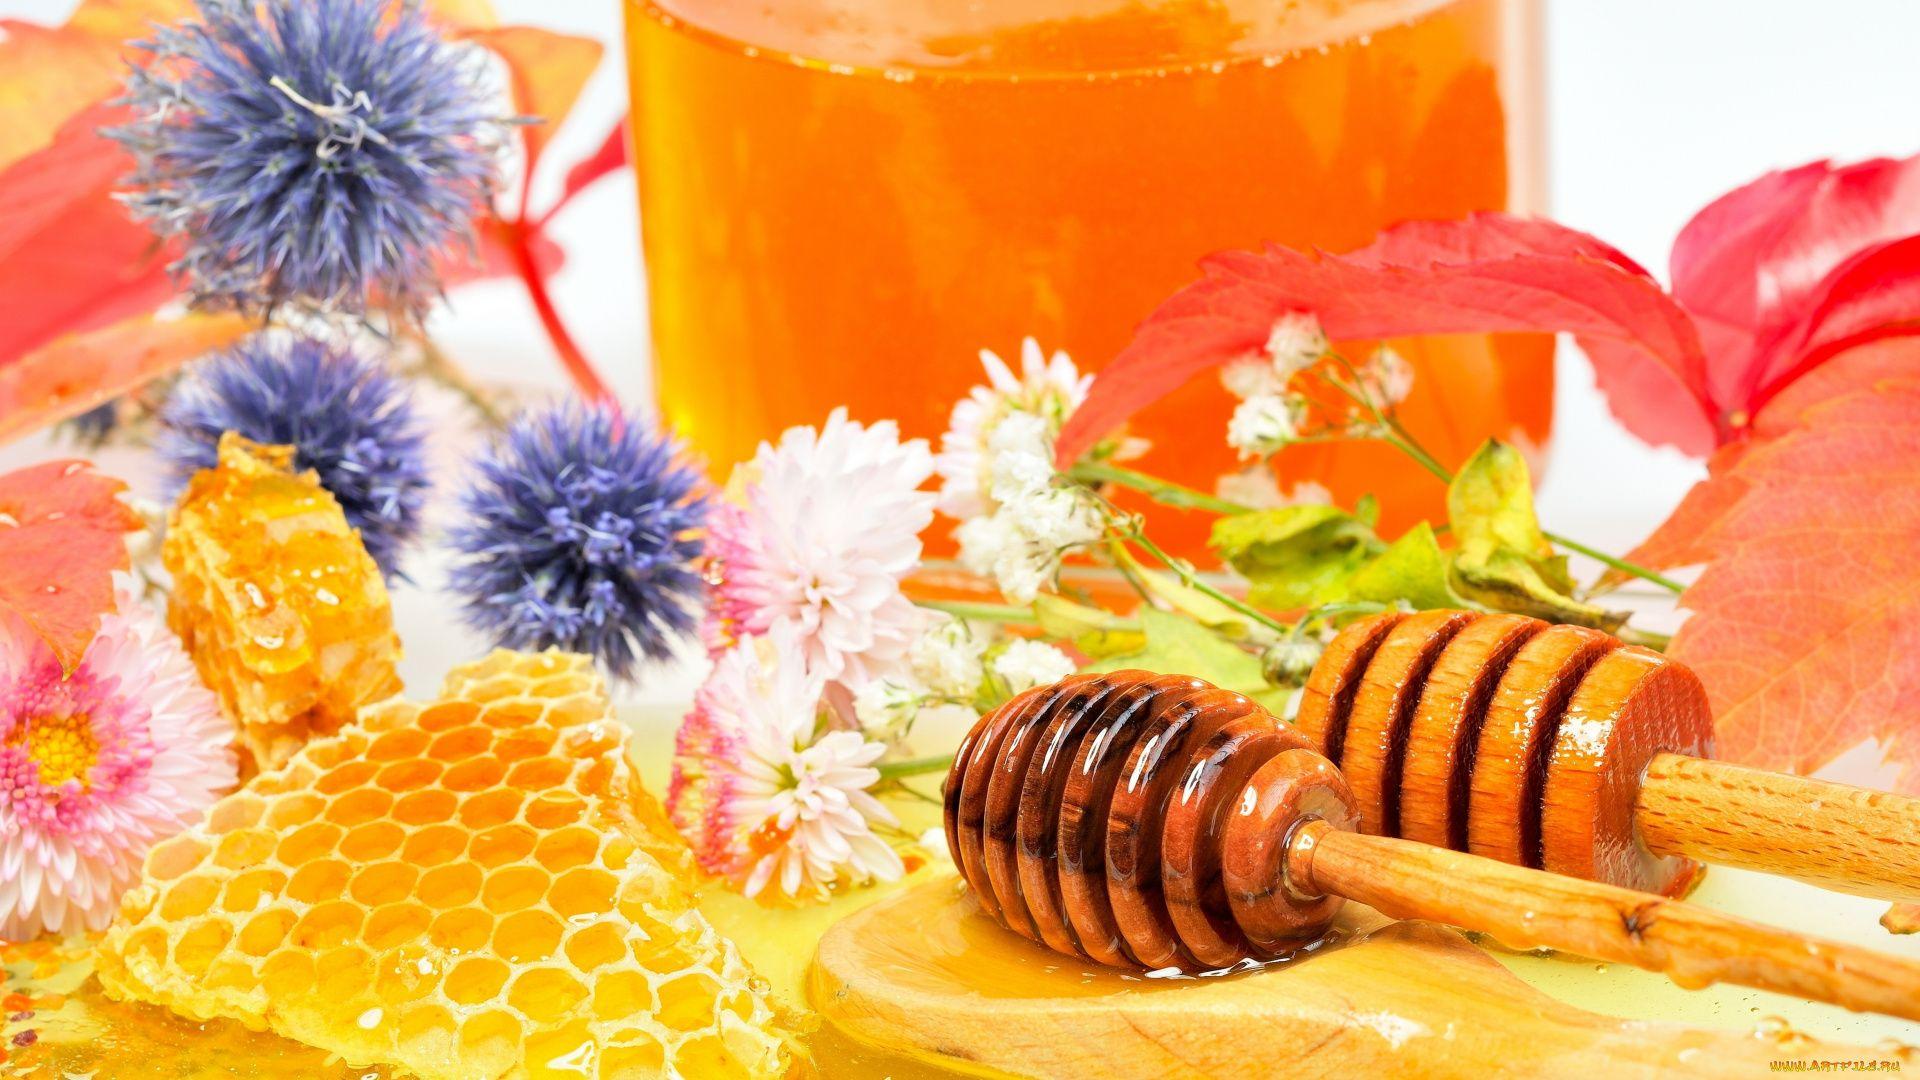 Honey screen wallpaper